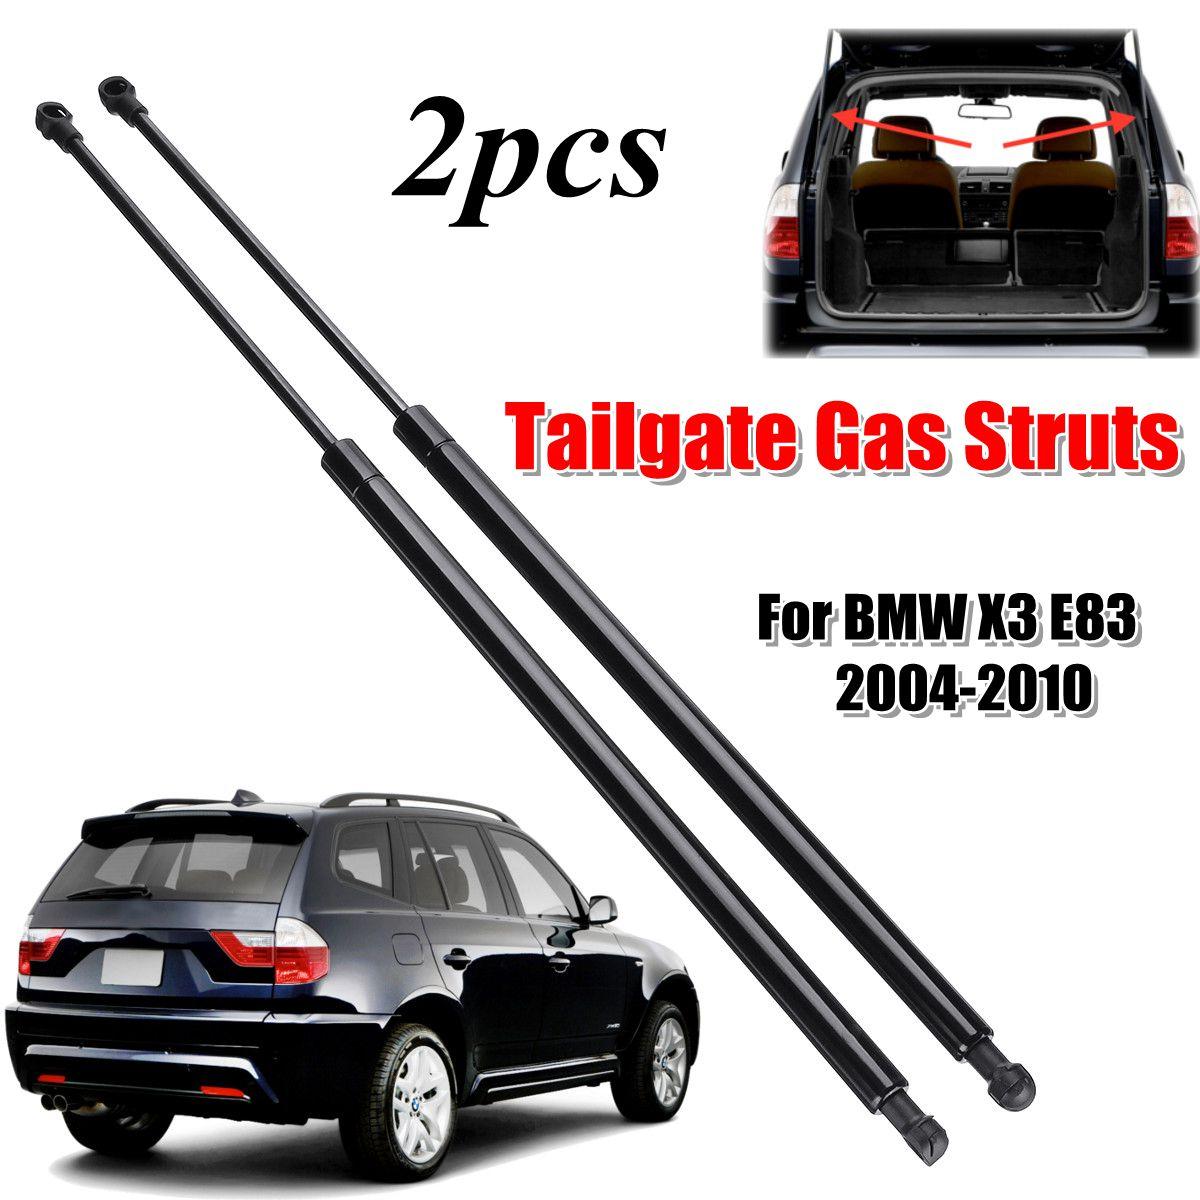 2 uds maletero trasero descarga de resorte de gas montacargas soporte barra brazo barras soporte 51243400379 para BMW E83 X3 2004 2005-2010